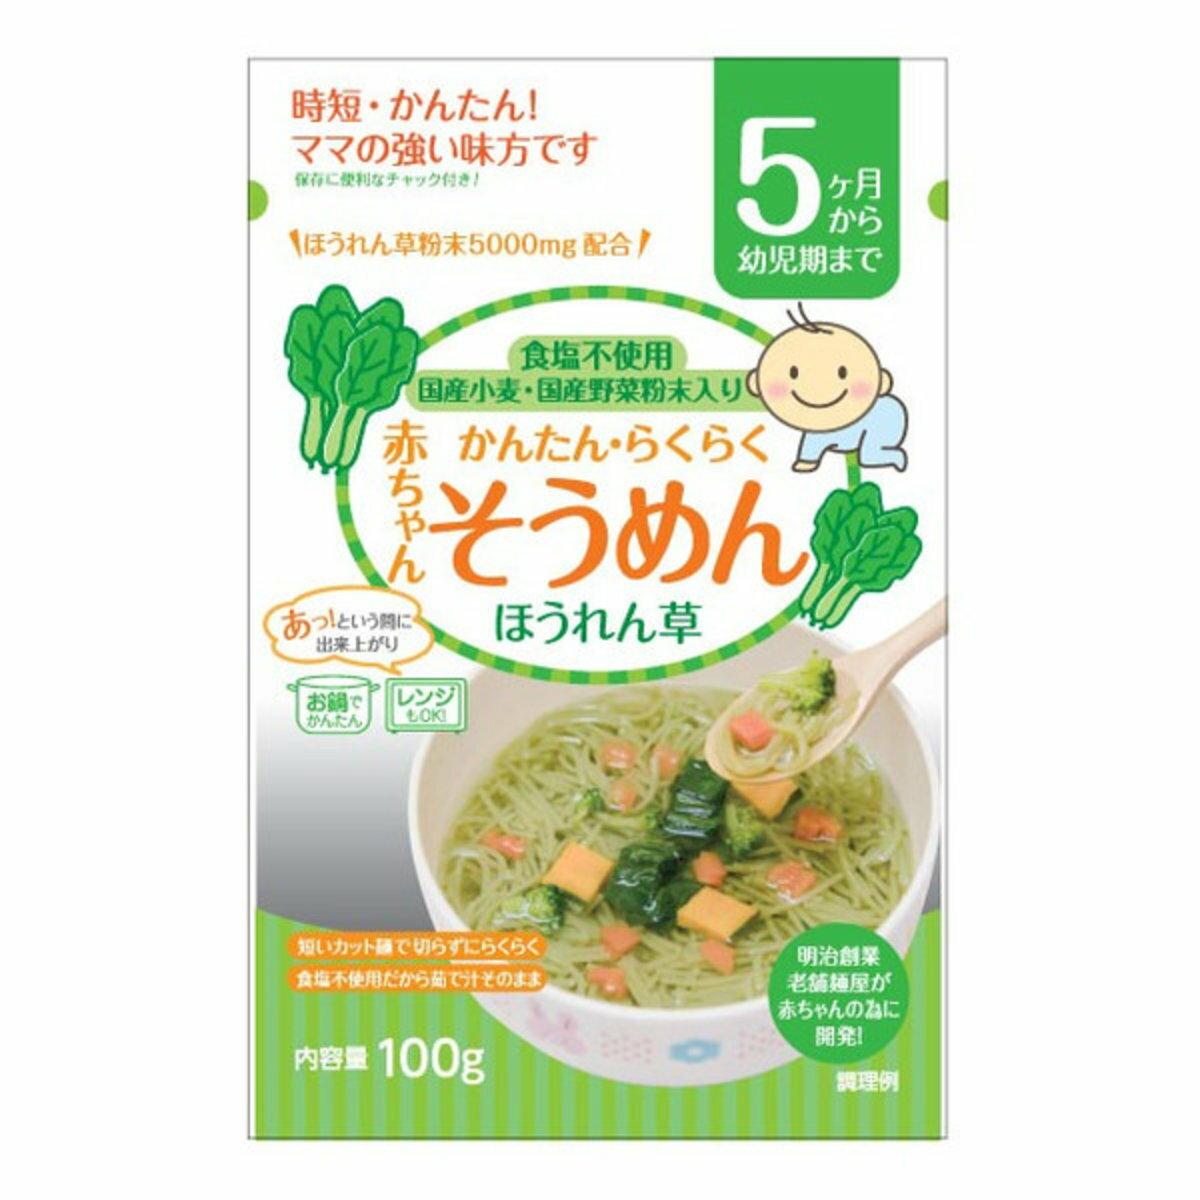 《Chara 微百貨》日本 hakubaku 田靡 寶寶 麵條 素麵 烏龍麵 100g 副食品 義大利麵 嬰兒 4